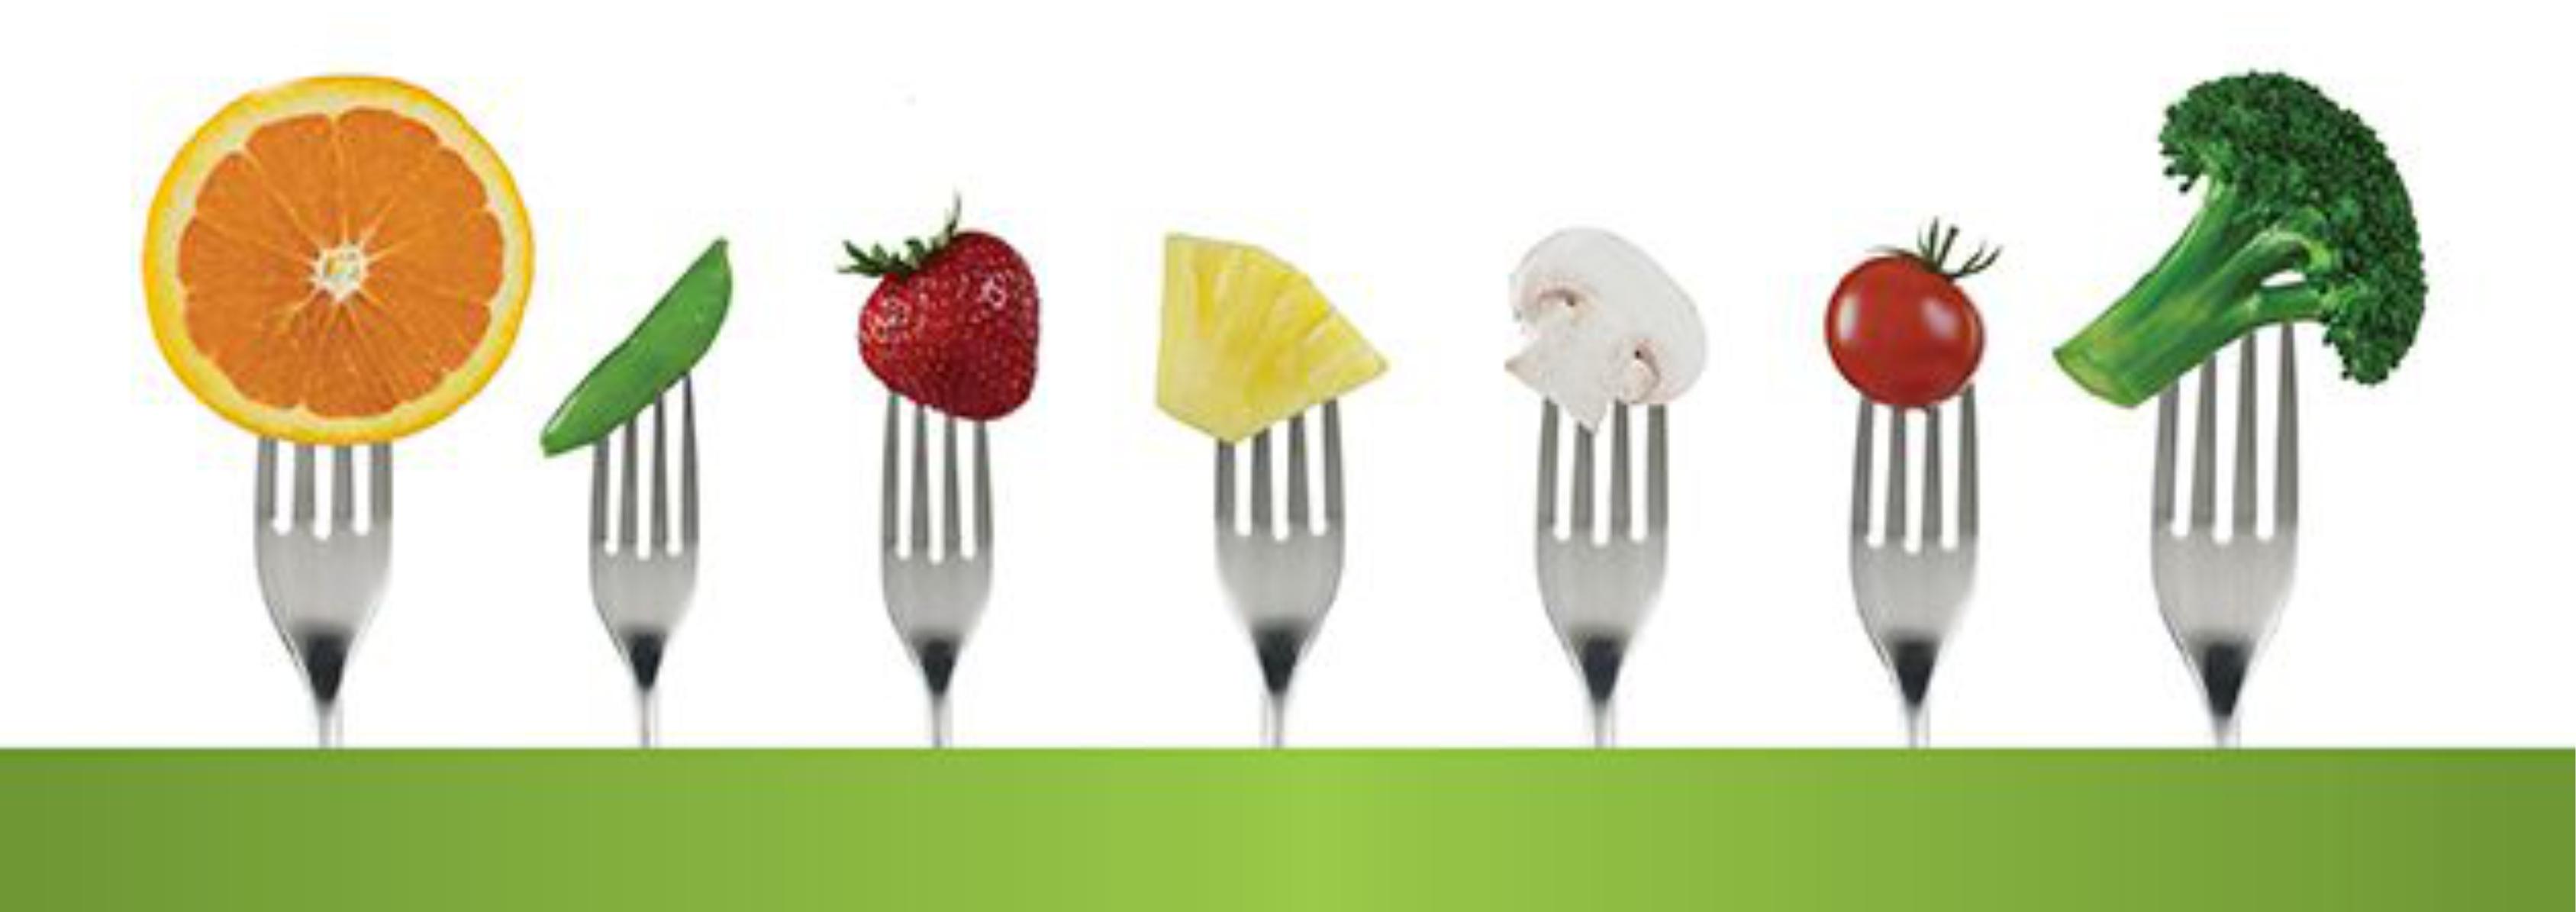 Nutrition month clip art clip art freeuse stock Cliparts nutrition month - ClipartFest clip art freeuse stock